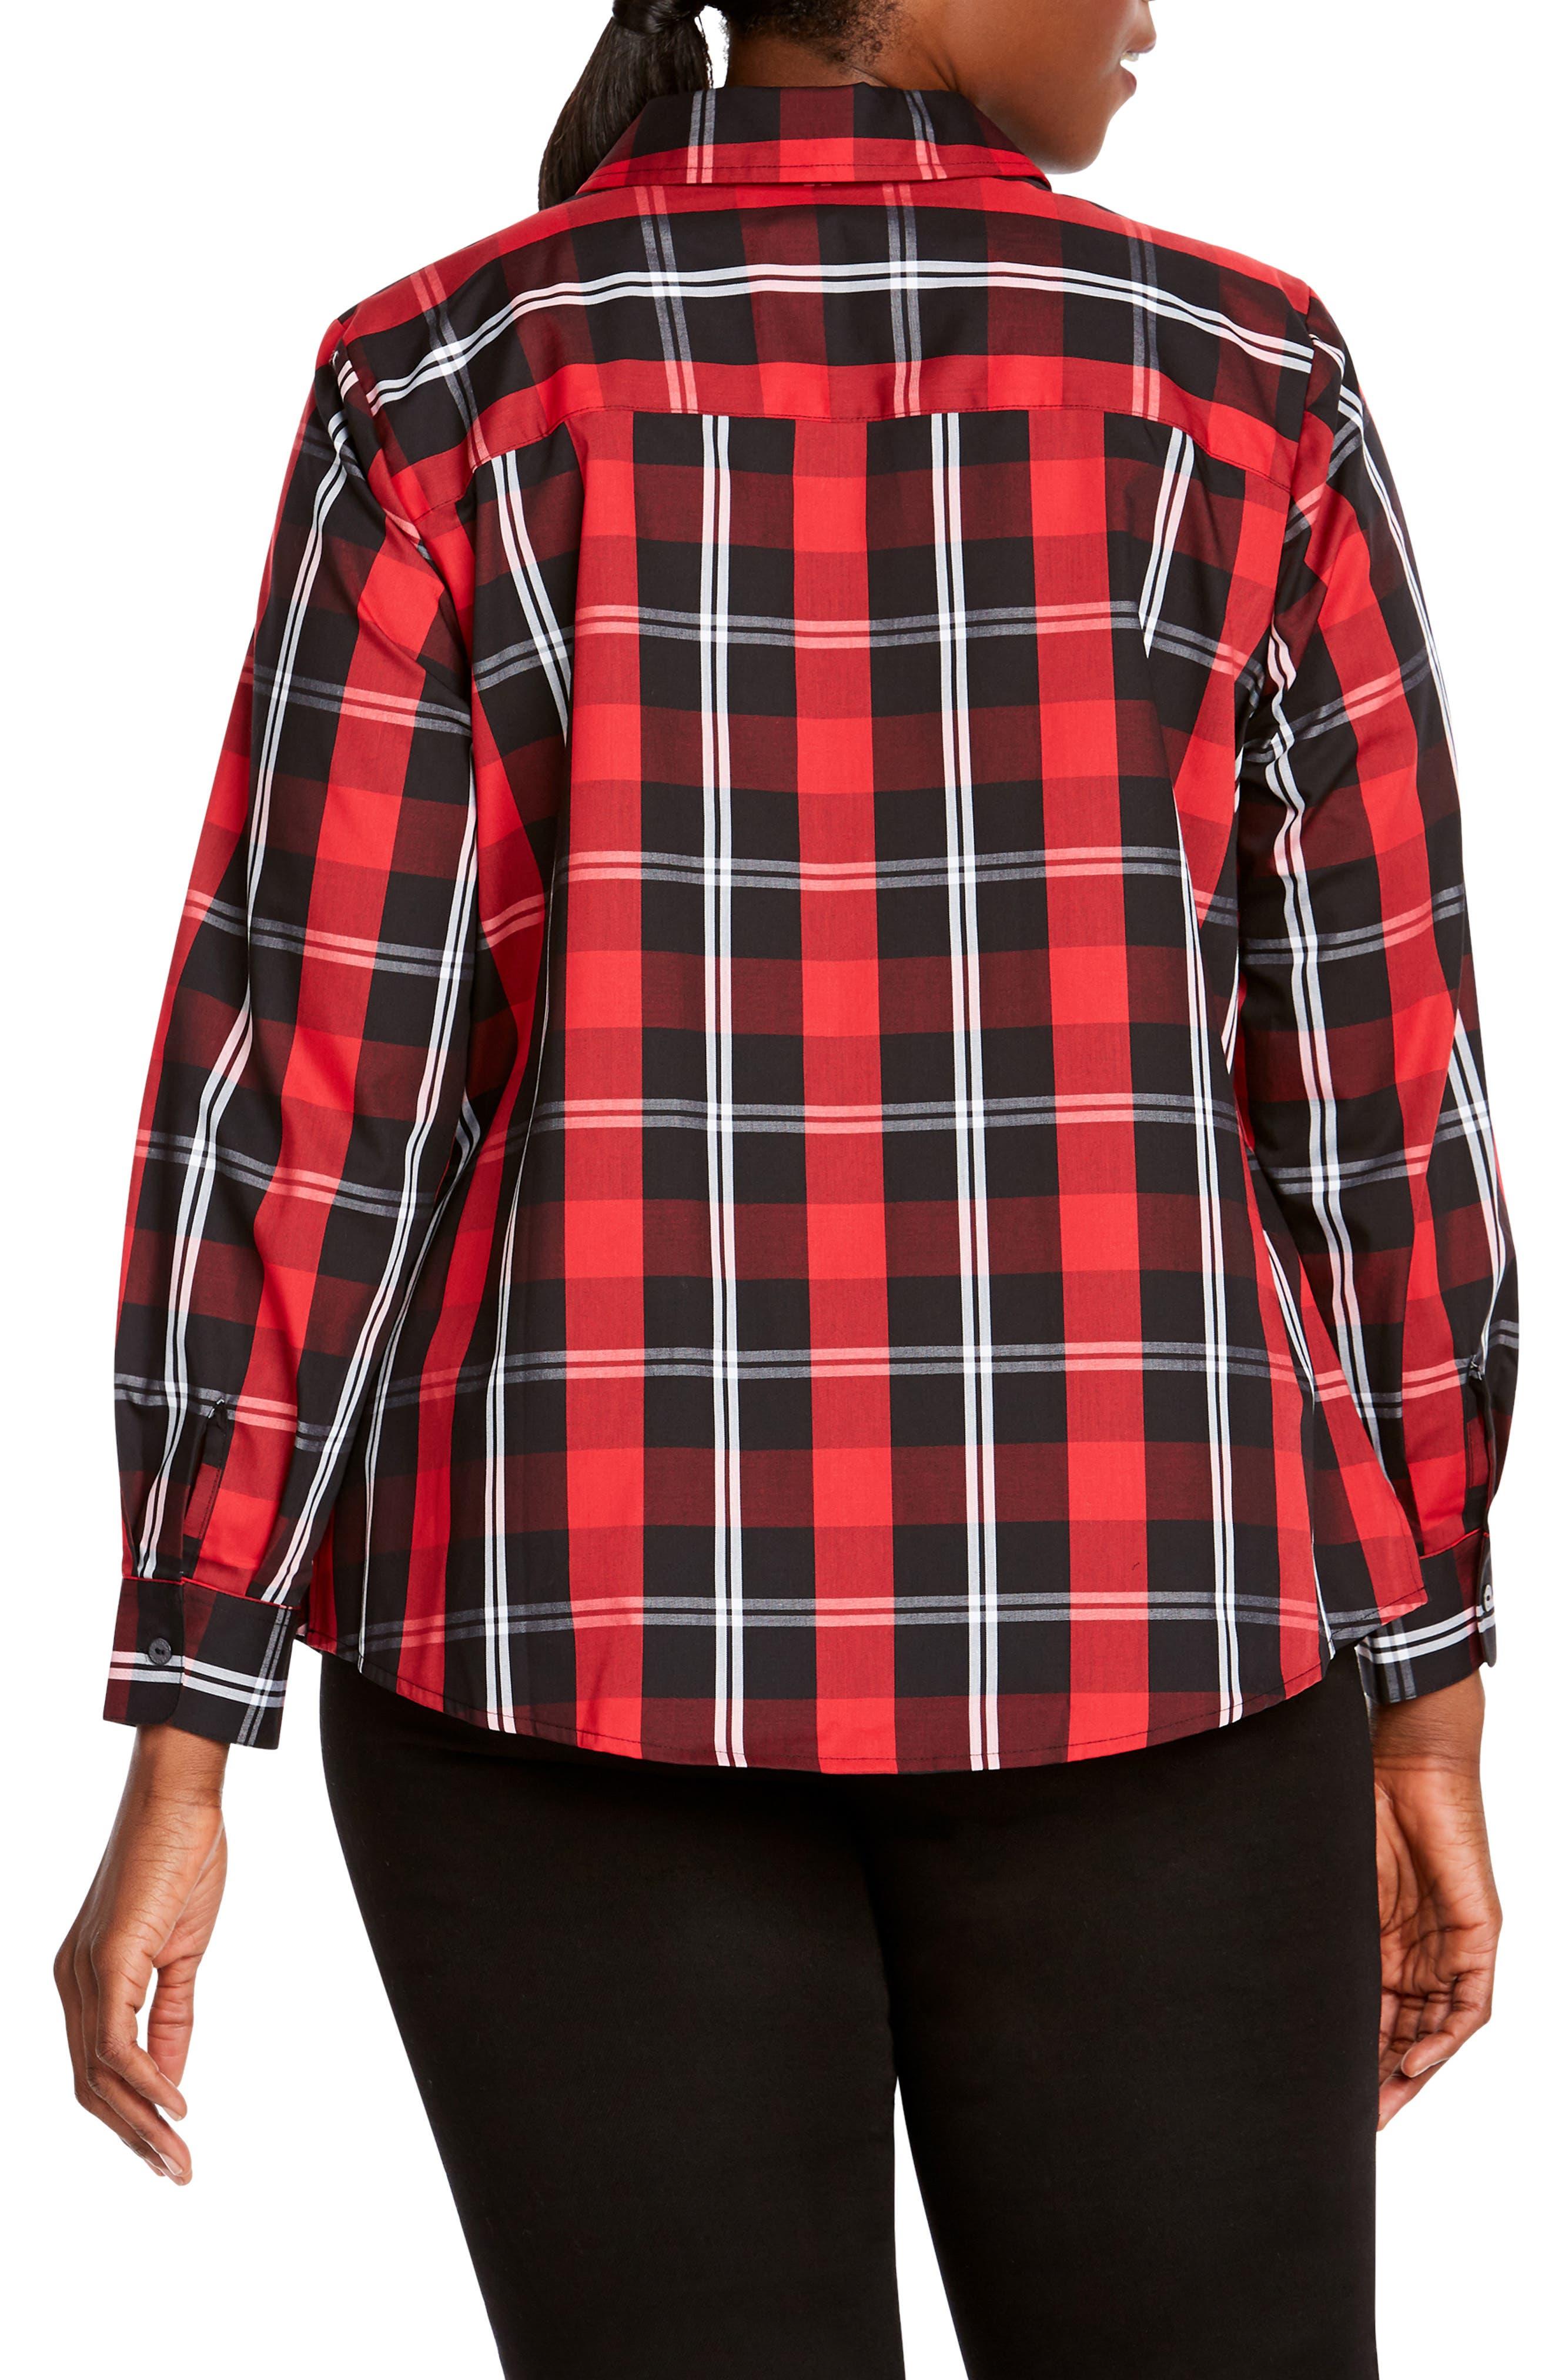 Tina Mackenzie Tartan Plaid Shirt,                             Alternate thumbnail 2, color,                             BLACK/ RED